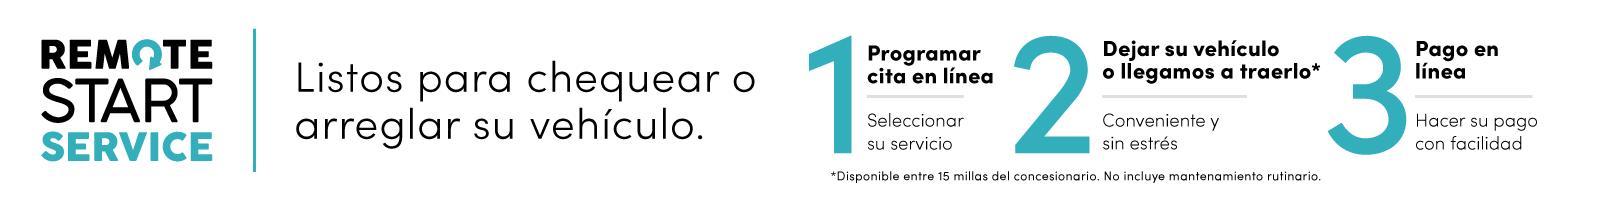 Remote start spanish banner VRP